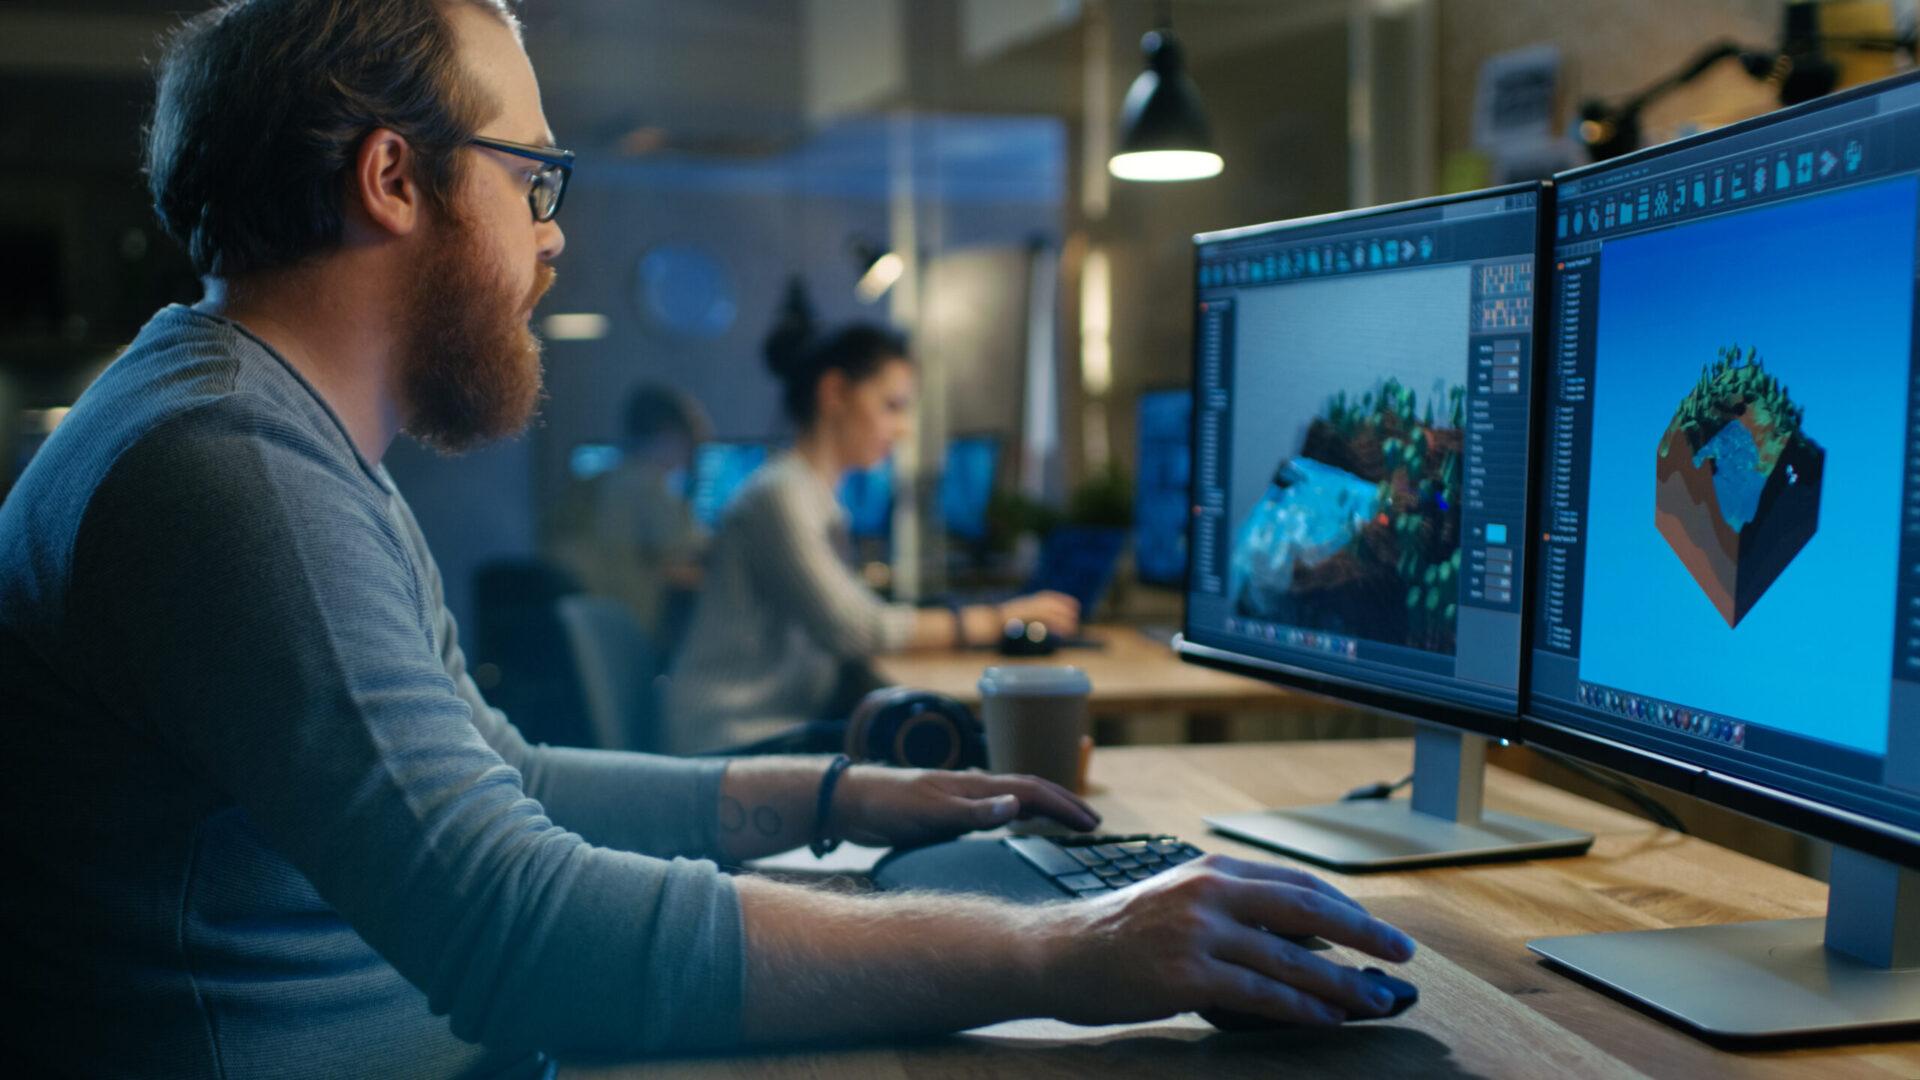 Sred in gaming industry